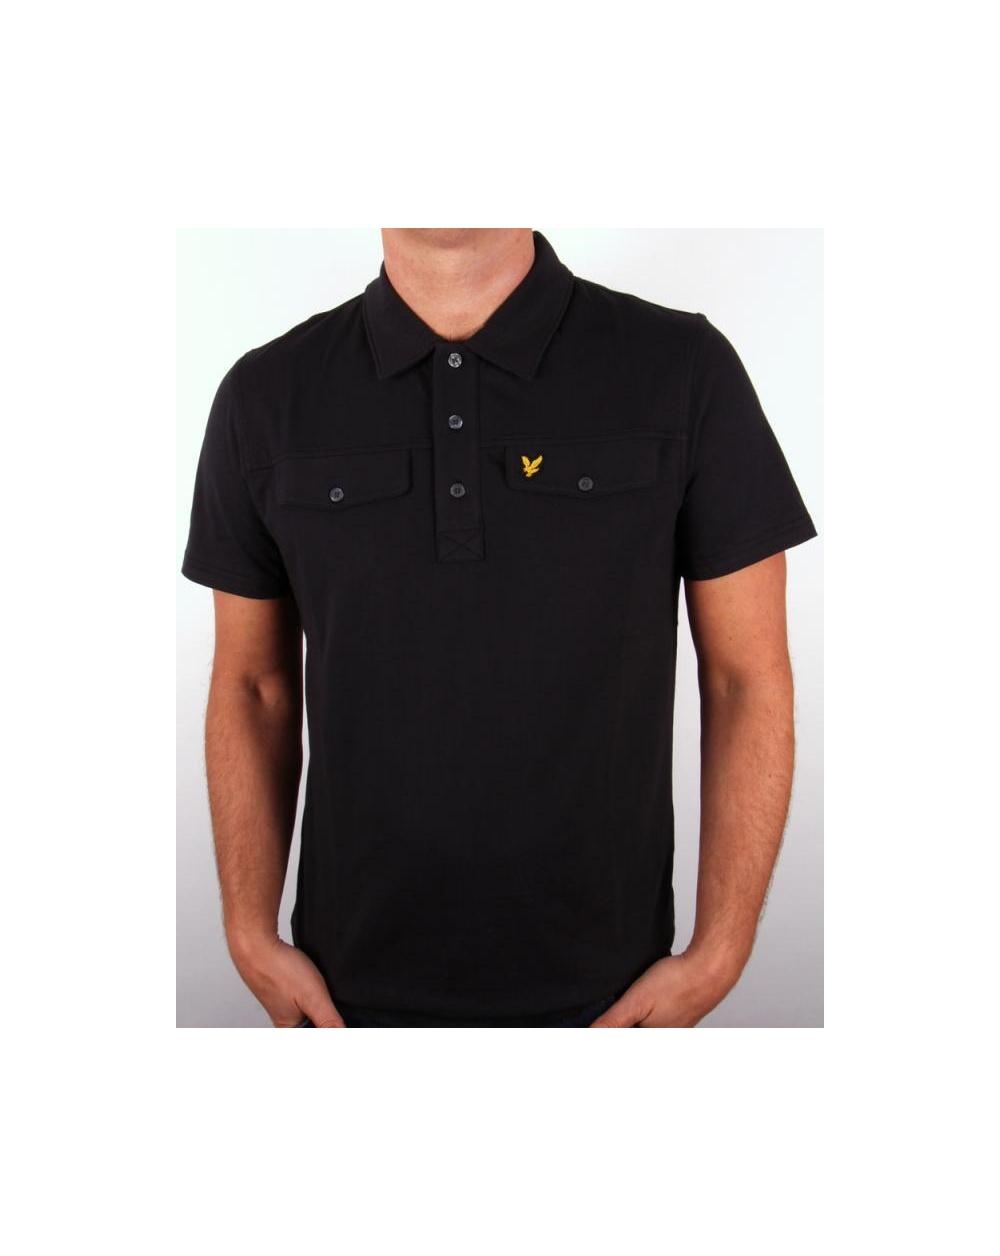 83082c708d8 Lyle And Scott Mock Pocket S s Polo Shirt Black - mens polo shirt